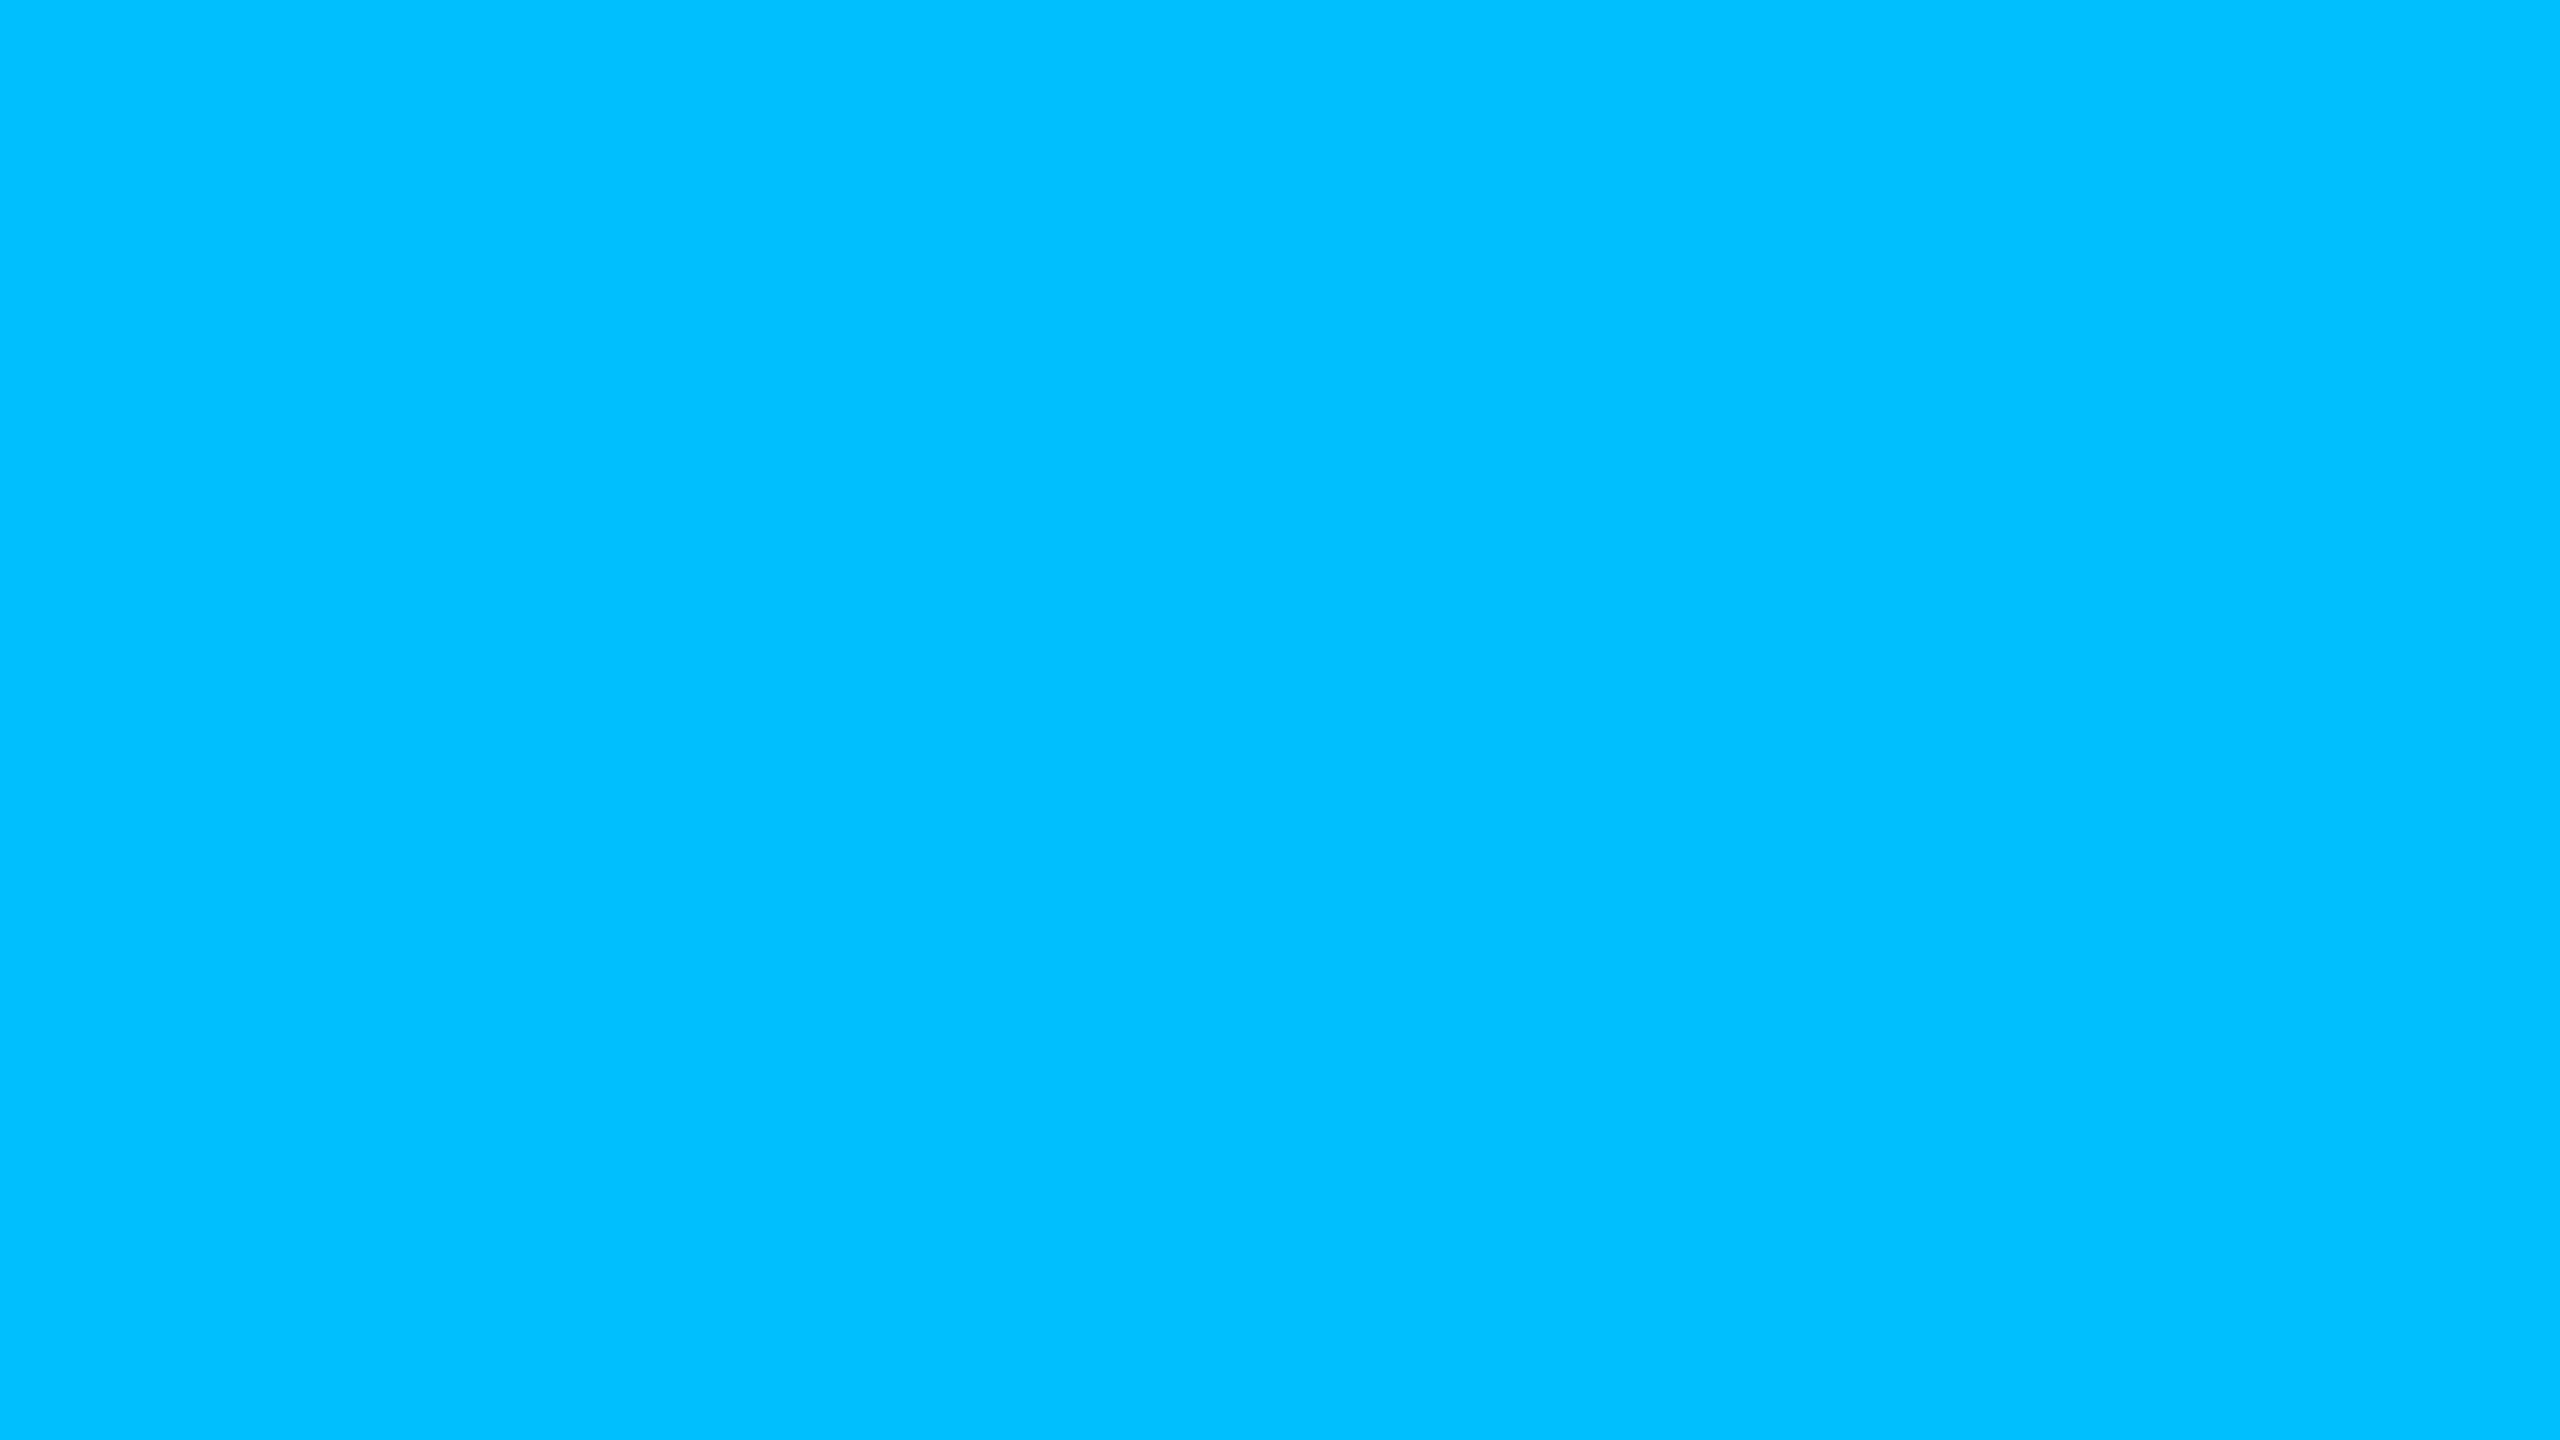 2560x1440 deep sky blue solid color background